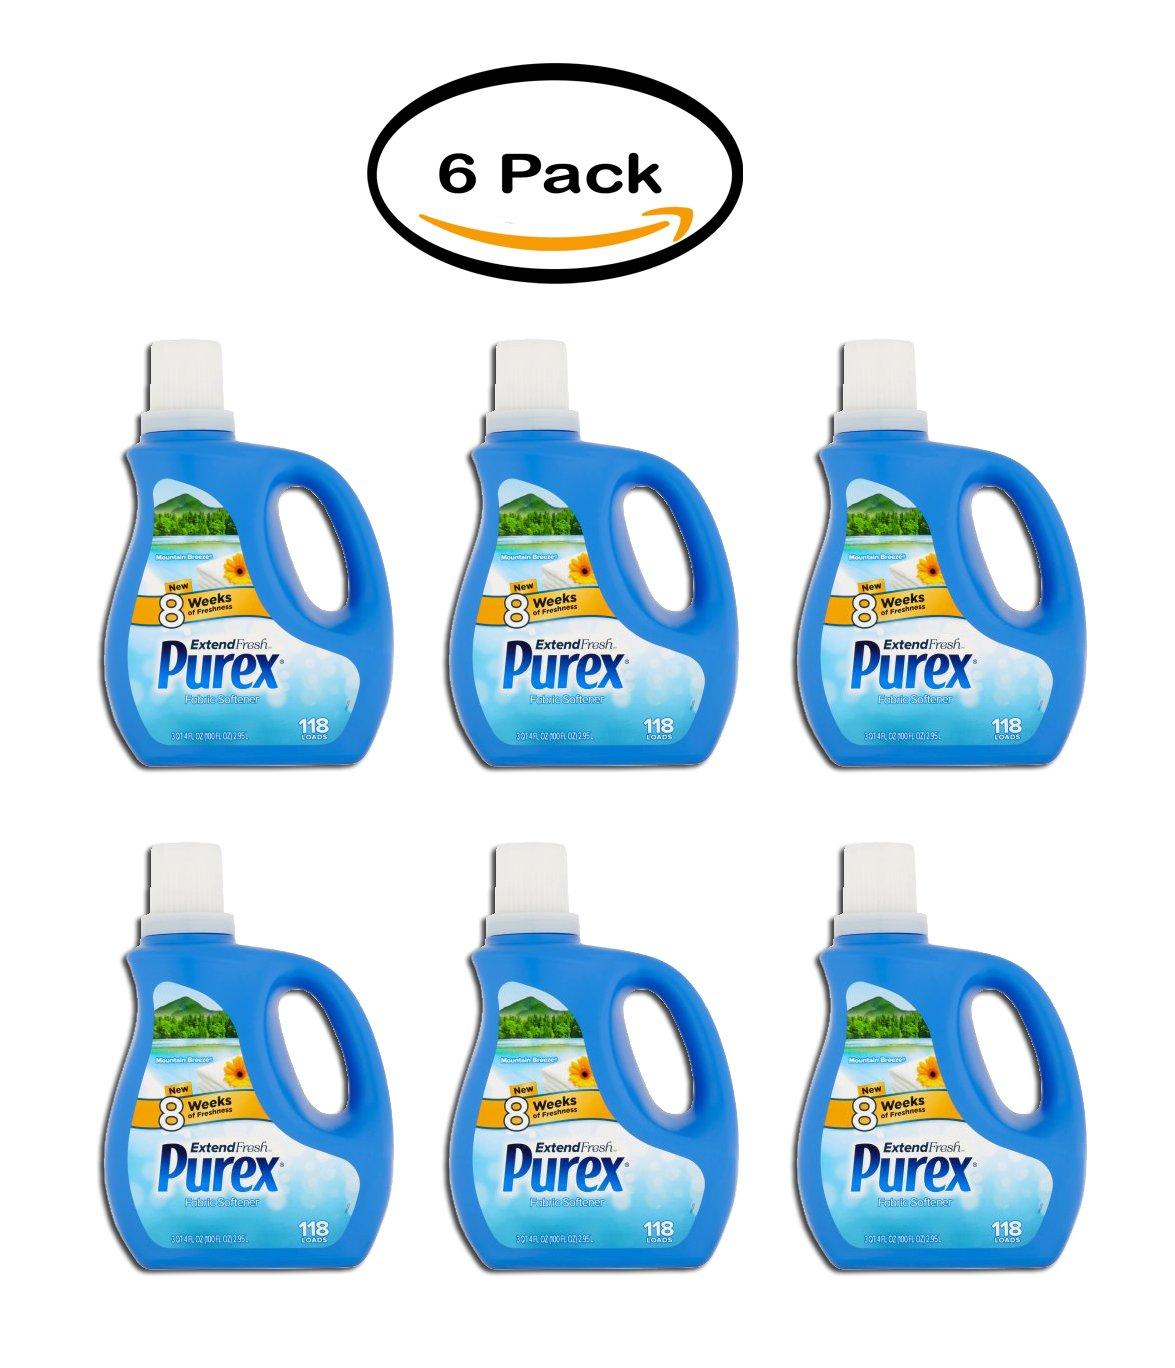 PACK OF 6 - Purex Extend Fresh Mountain Breeze Fabric Softener, 118 loads, 4 fl oz